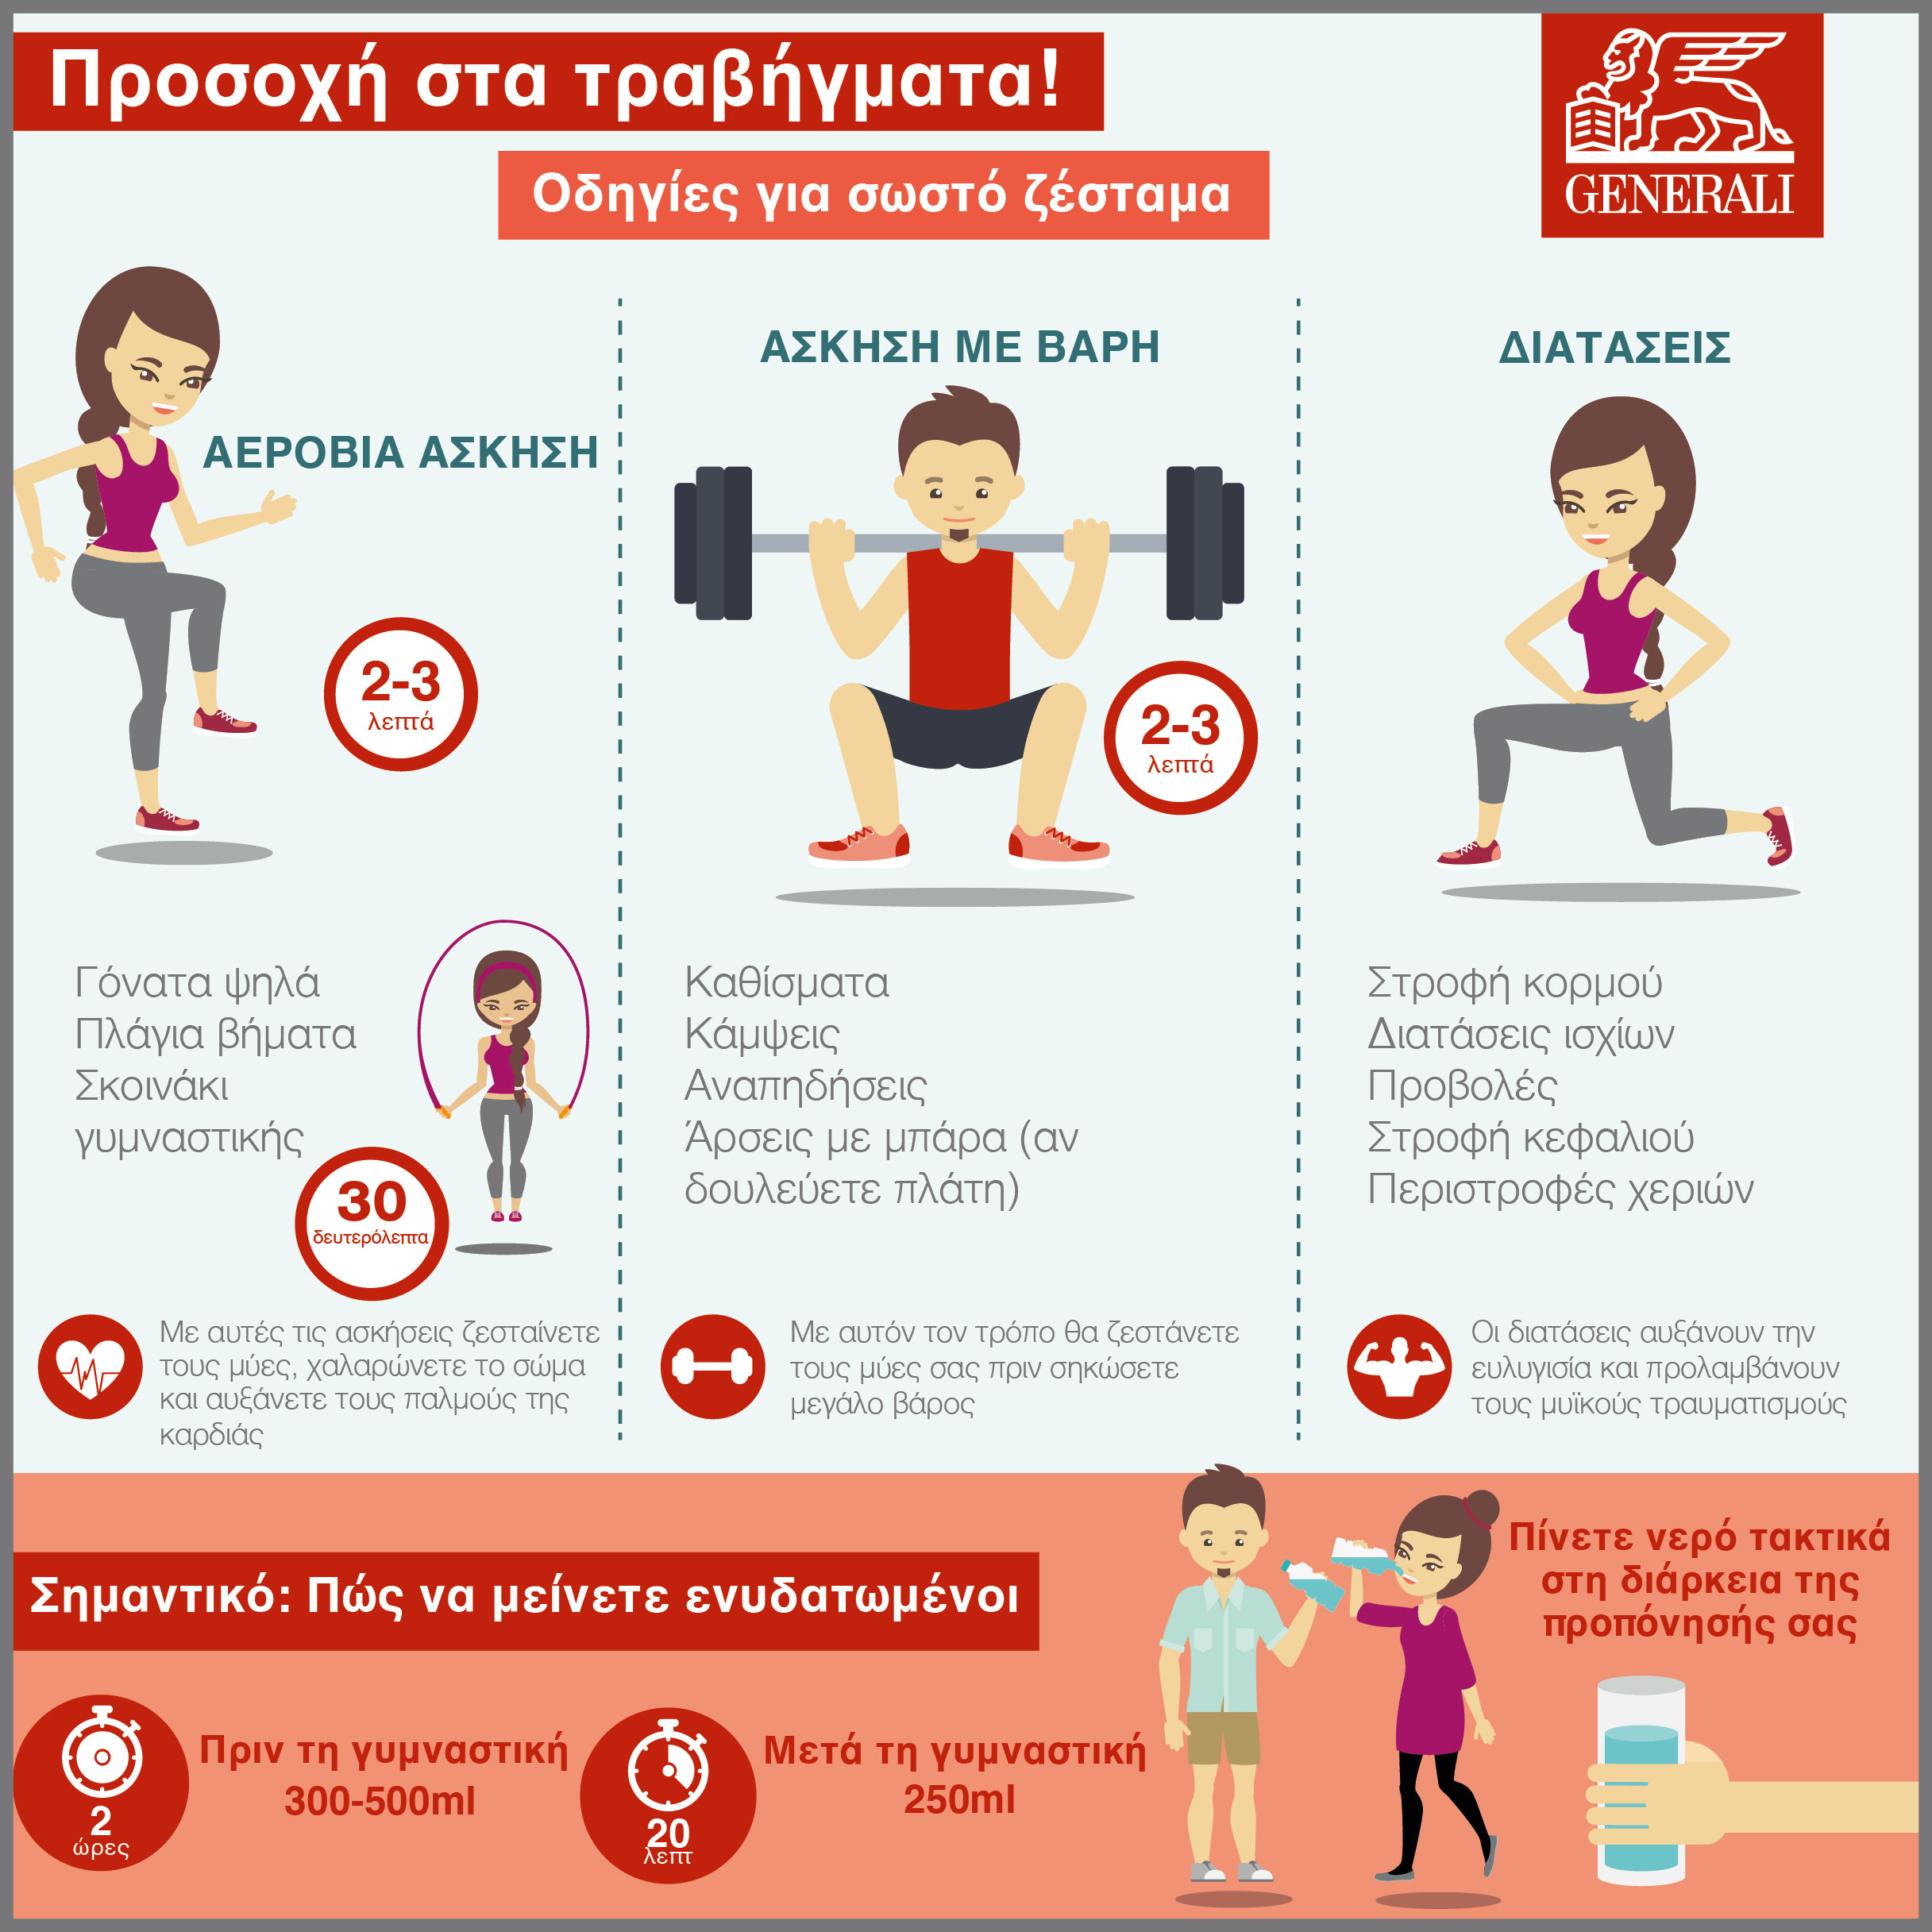 Generali Exercise Infographic Greek.jpg